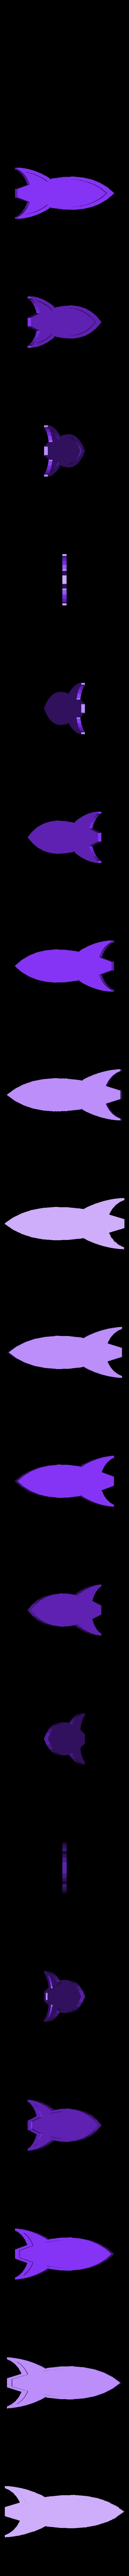 blank_rocket.stl Download free STL file Customizable Futurama Rocket With Alien Text • 3D printer model, ferjerez3d